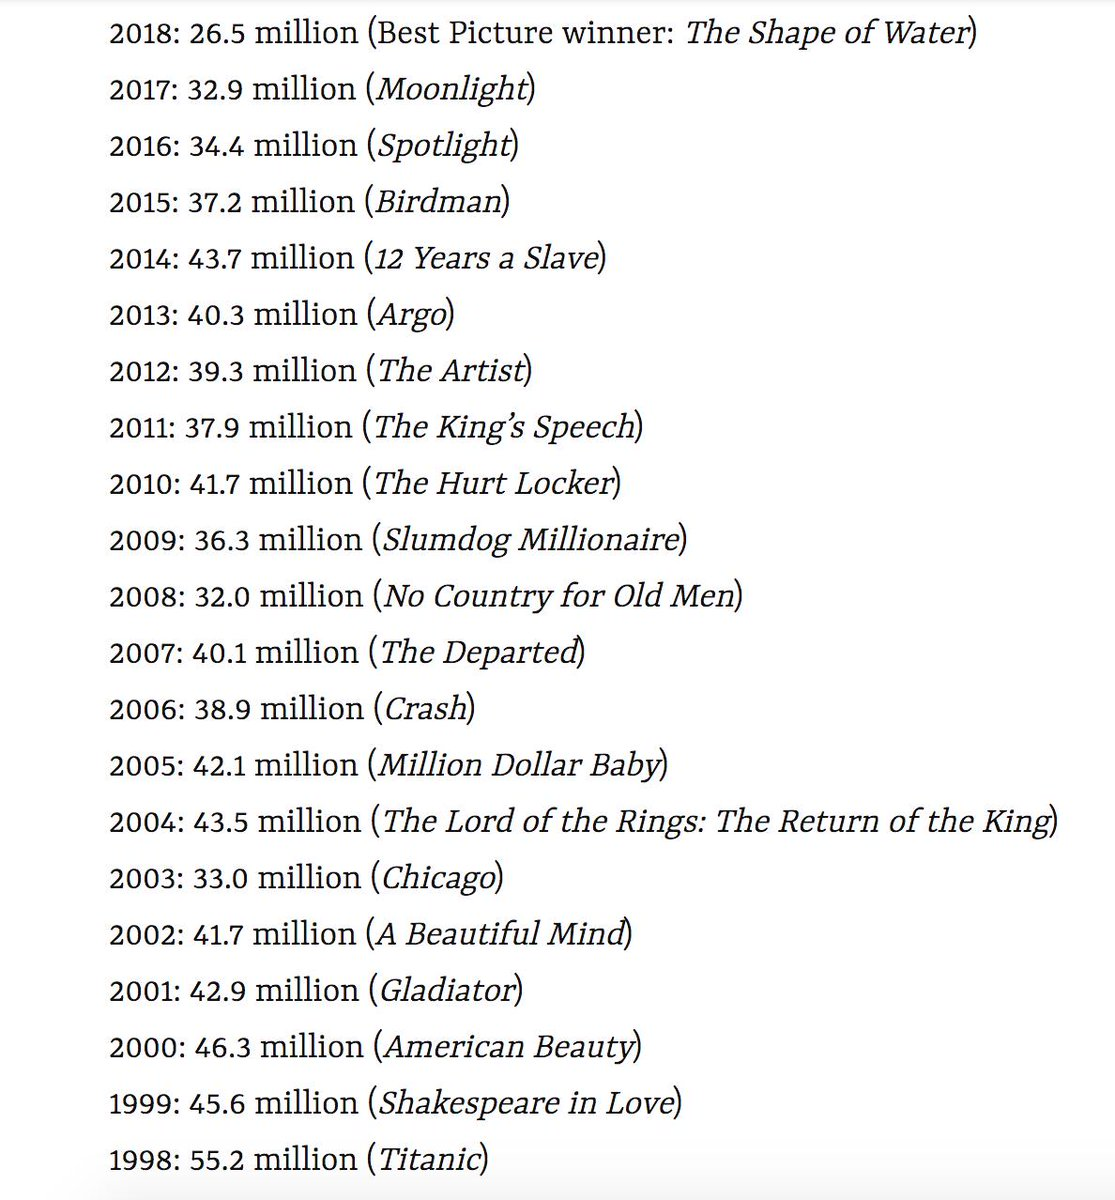 Oscars viewership over the last 20